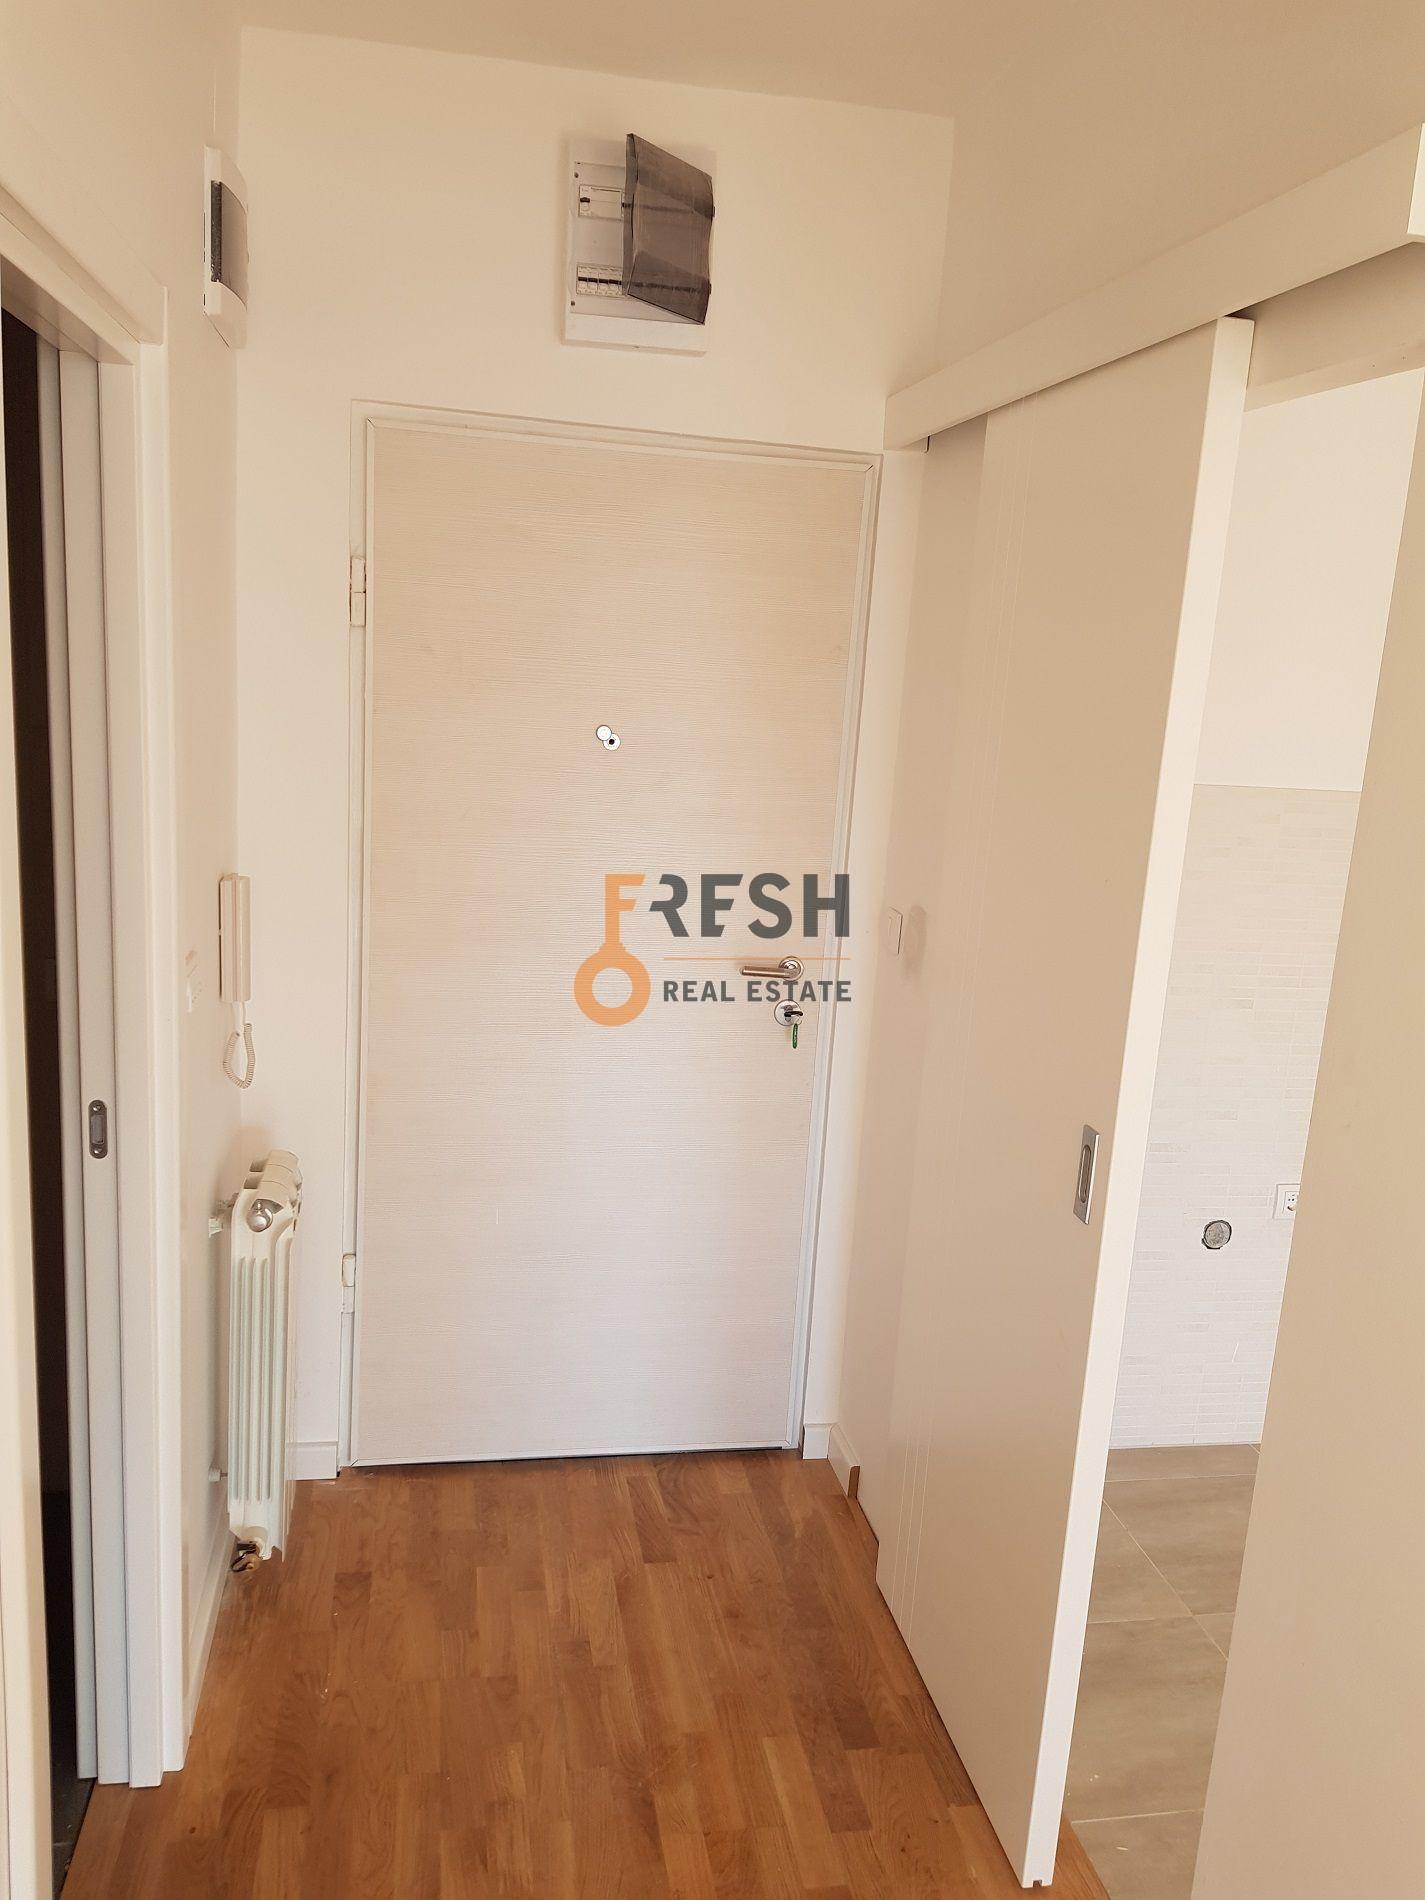 Jednosoban stan 45 m2, Centar, Pljevlja, Prodaja - 14